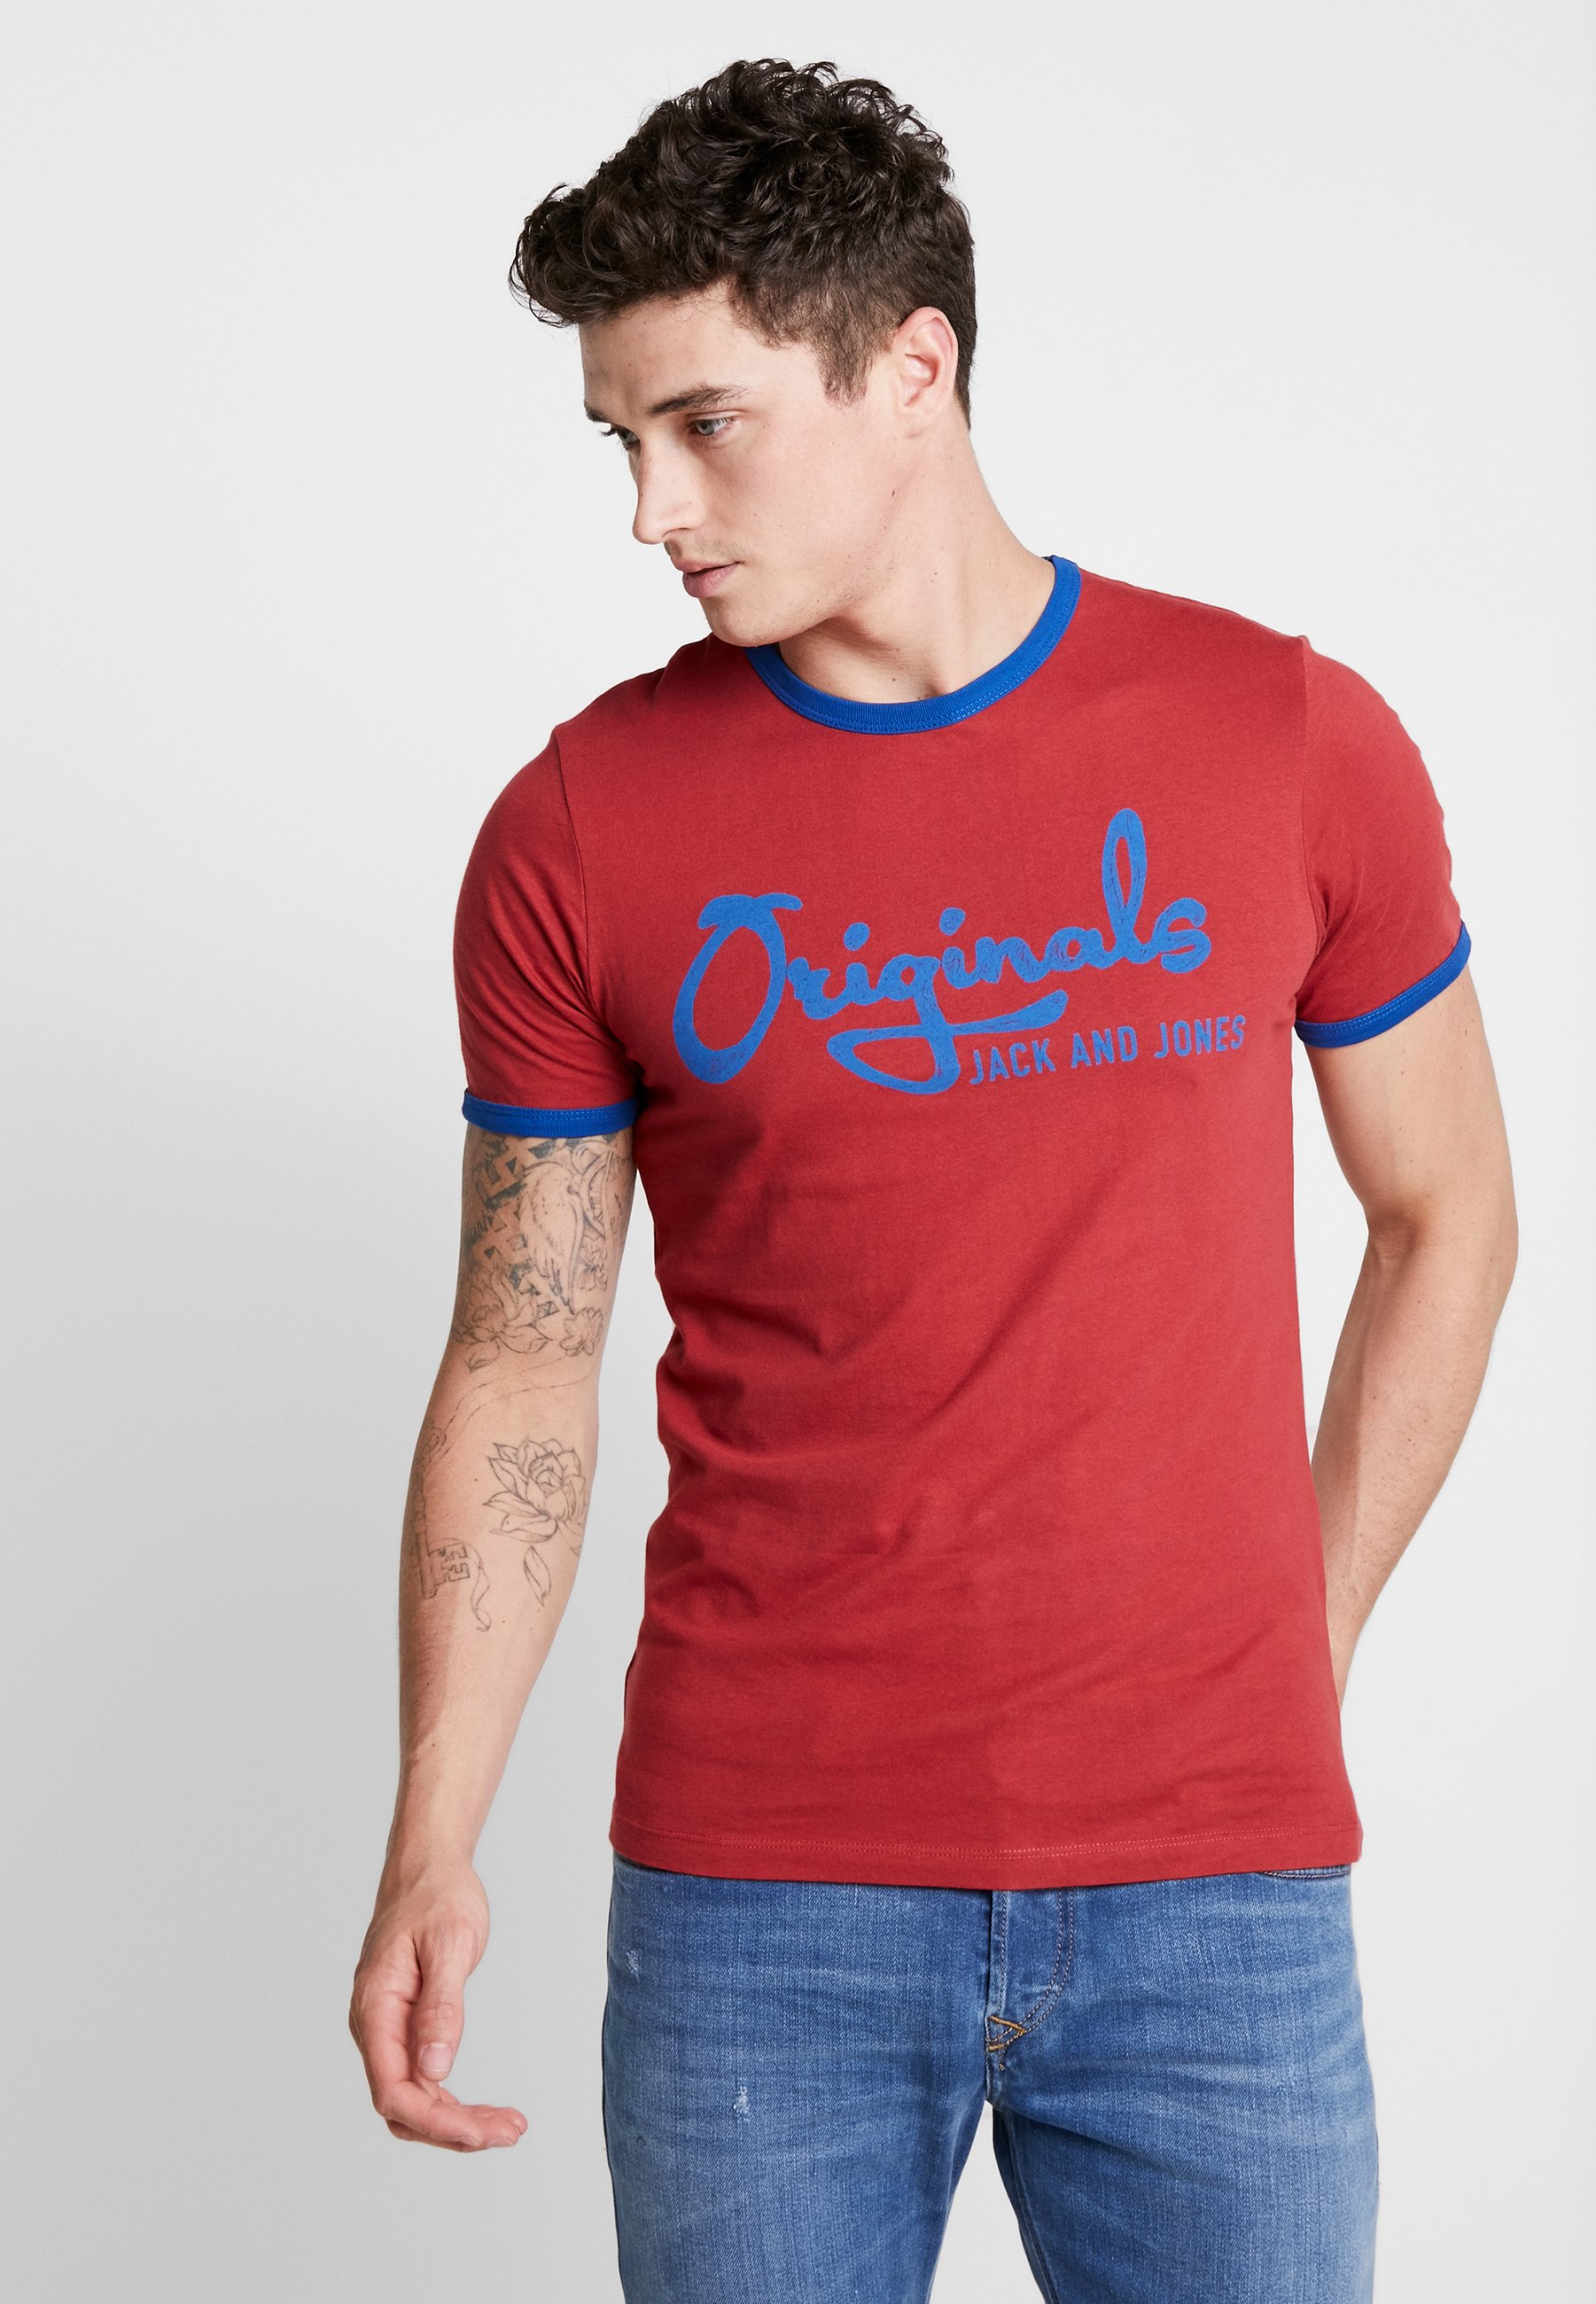 Jones Imprimé Jorlegend Crew NeckT Brick shirt Red Tee Jackamp; c3R4Aj5qL